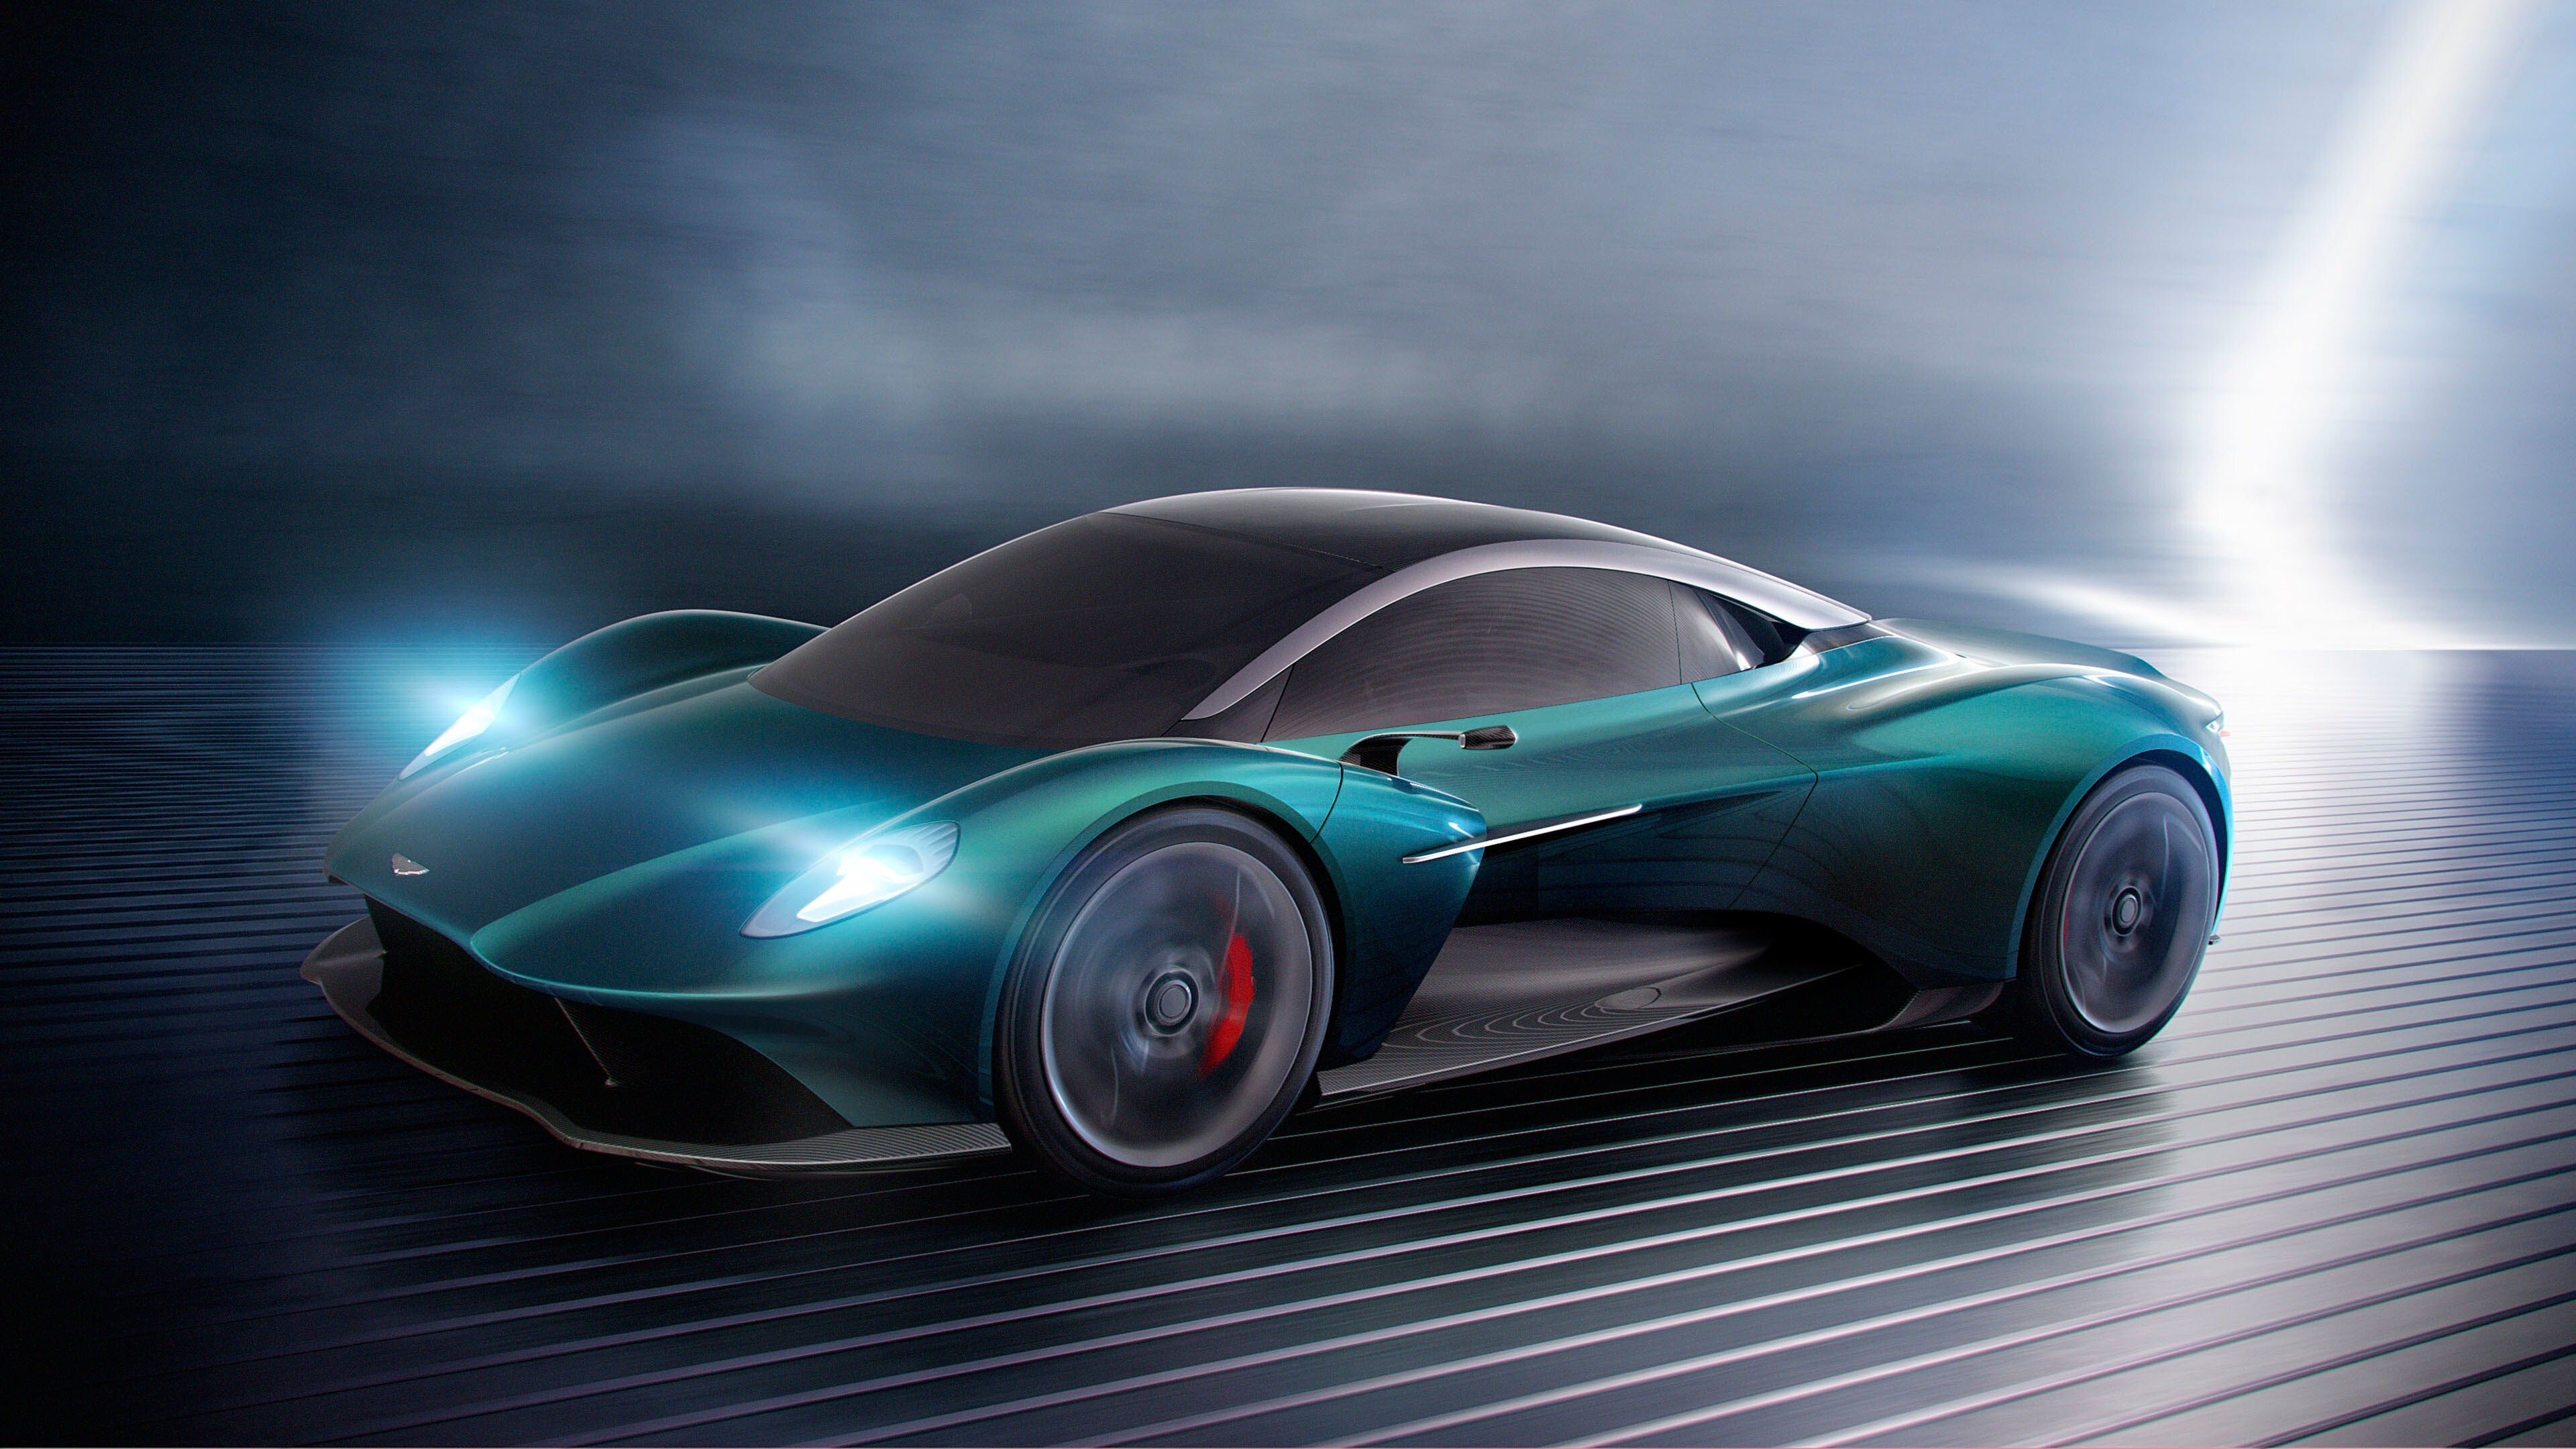 4k Photo Of 2019 Aston Martin Vanquish Vision Car Hd